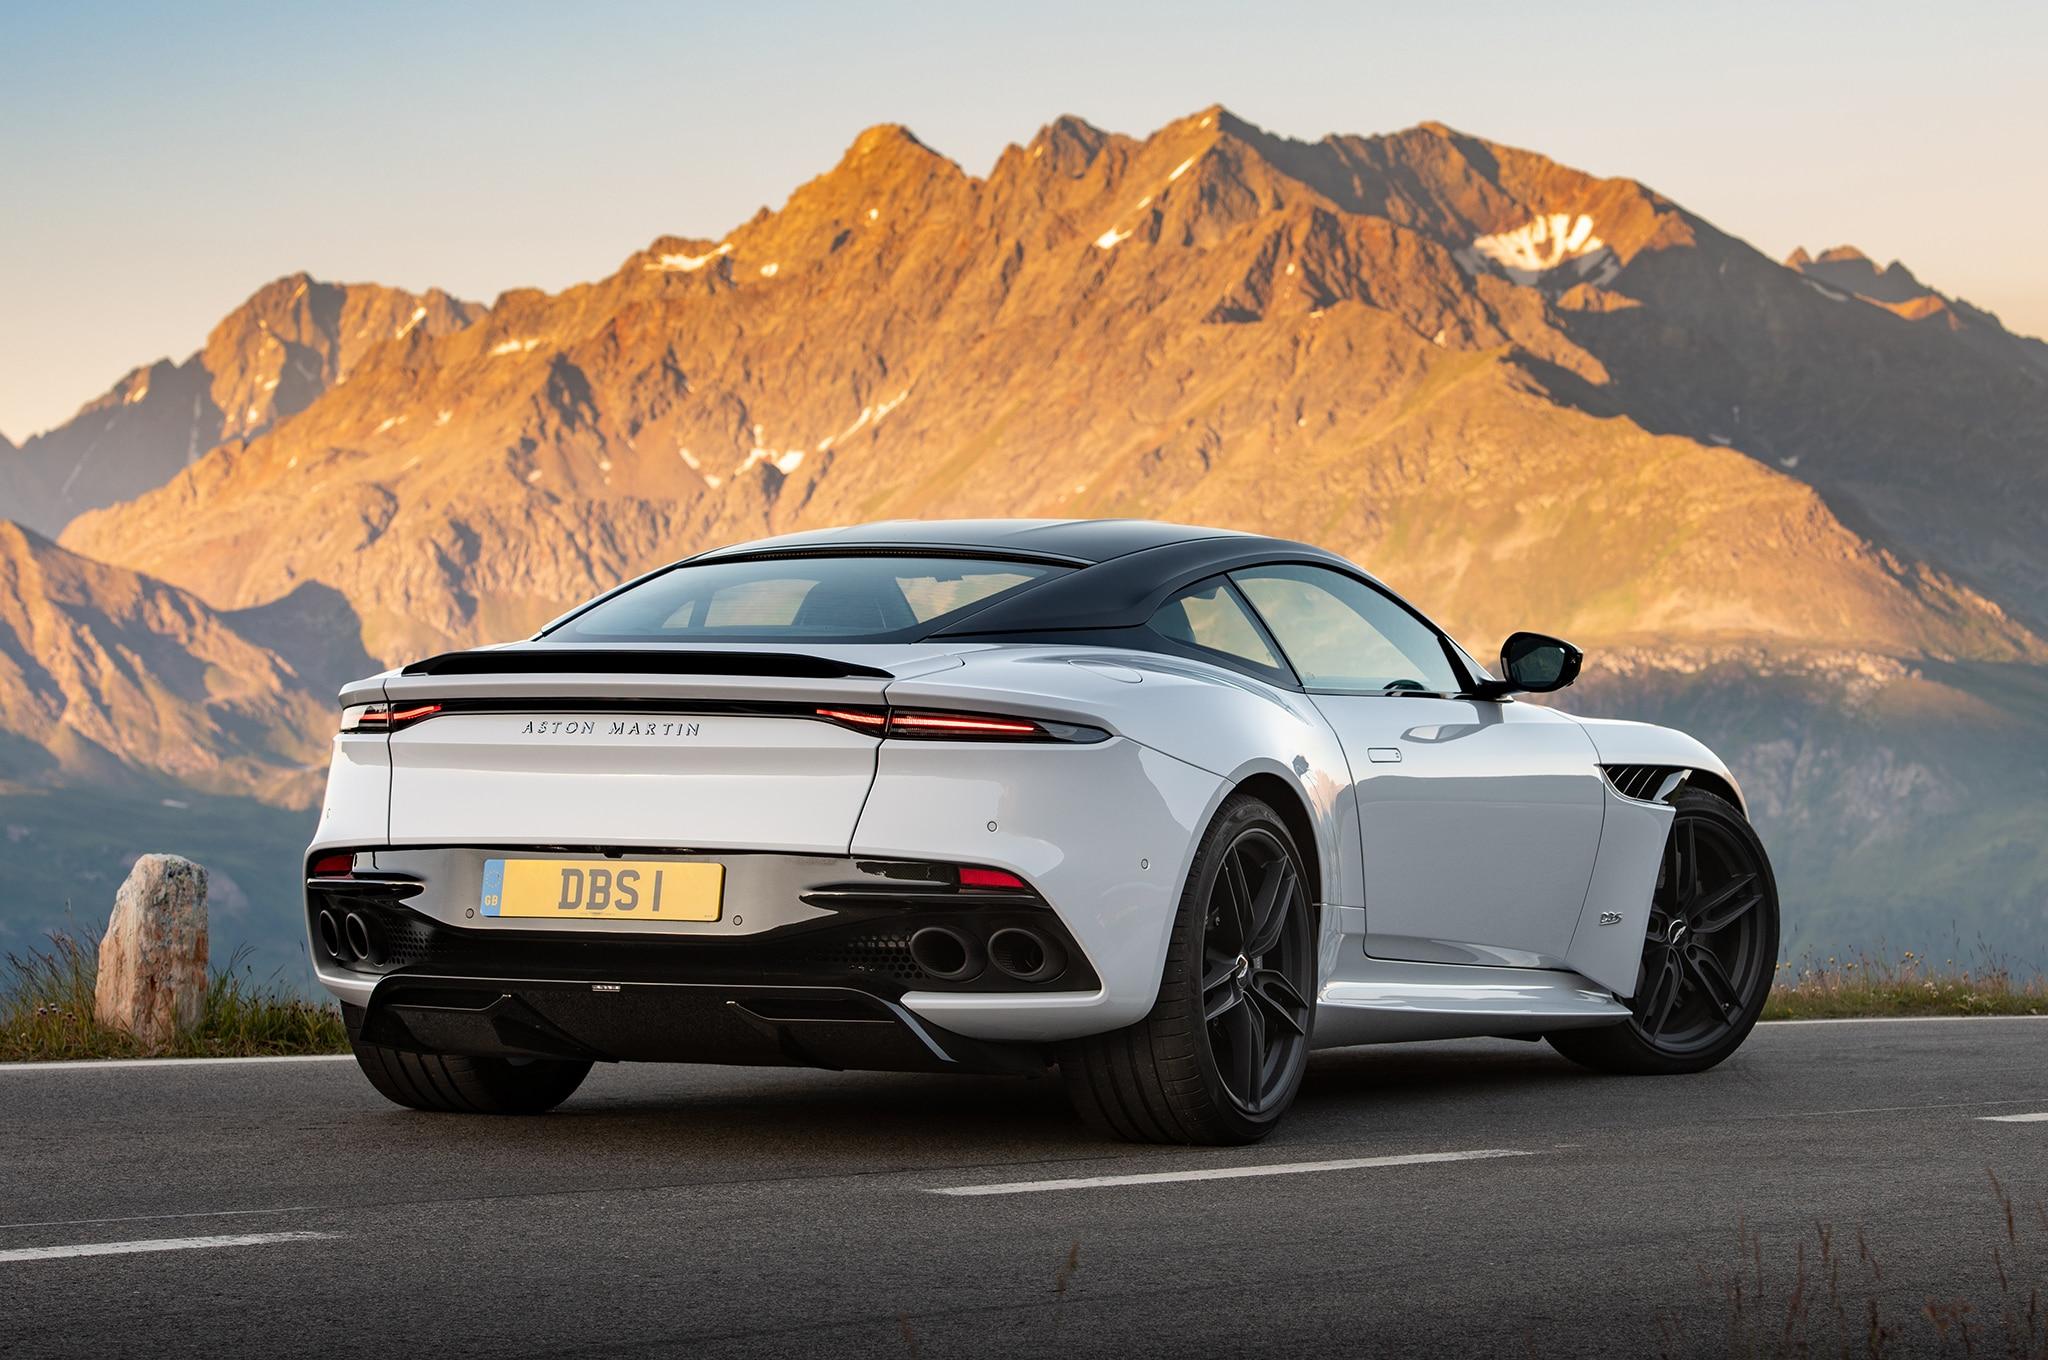 Aston Martin Dbs Superleggera Will Add Volante Amr Variants